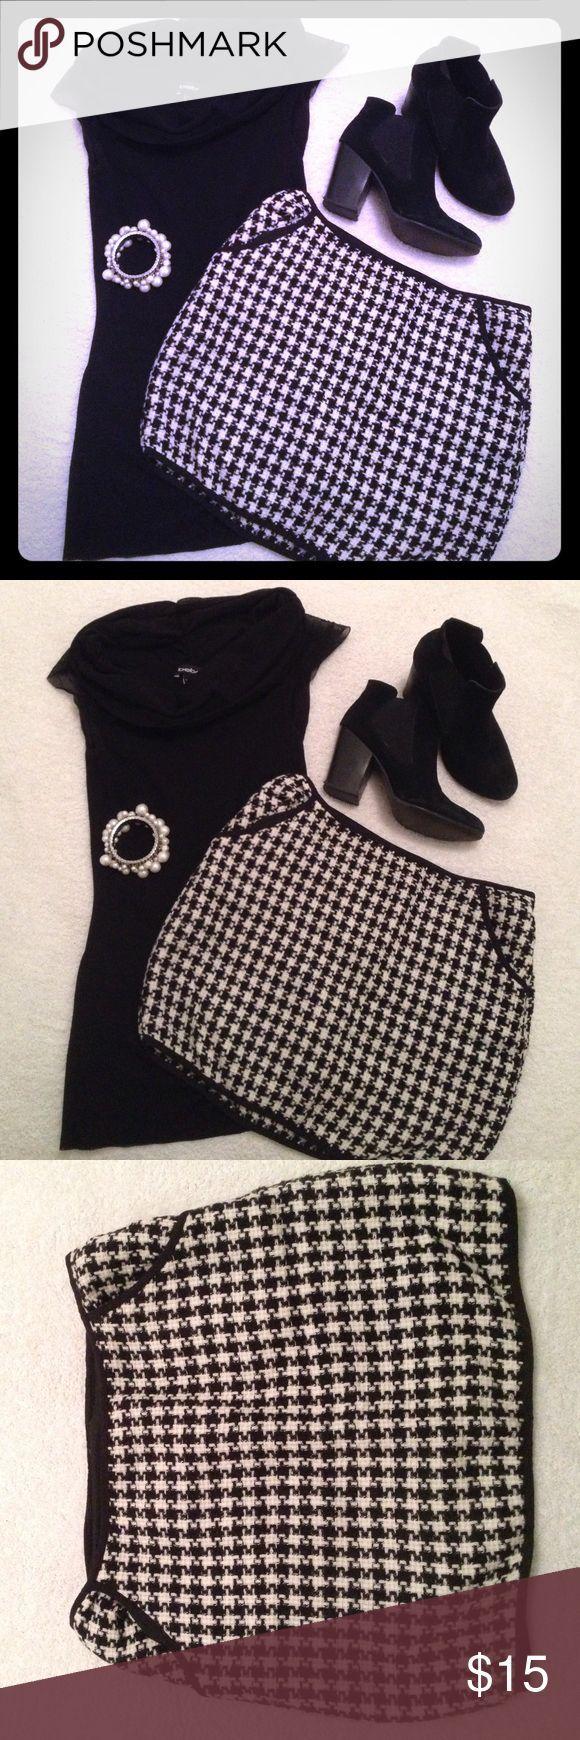 Selling this Black and white Checkered Skirt on Poshmark! My username is: babydoll_xxxx. #shopmycloset #poshmark #fashion #shopping #style #forsale #Forever 21 #Dresses & Skirts